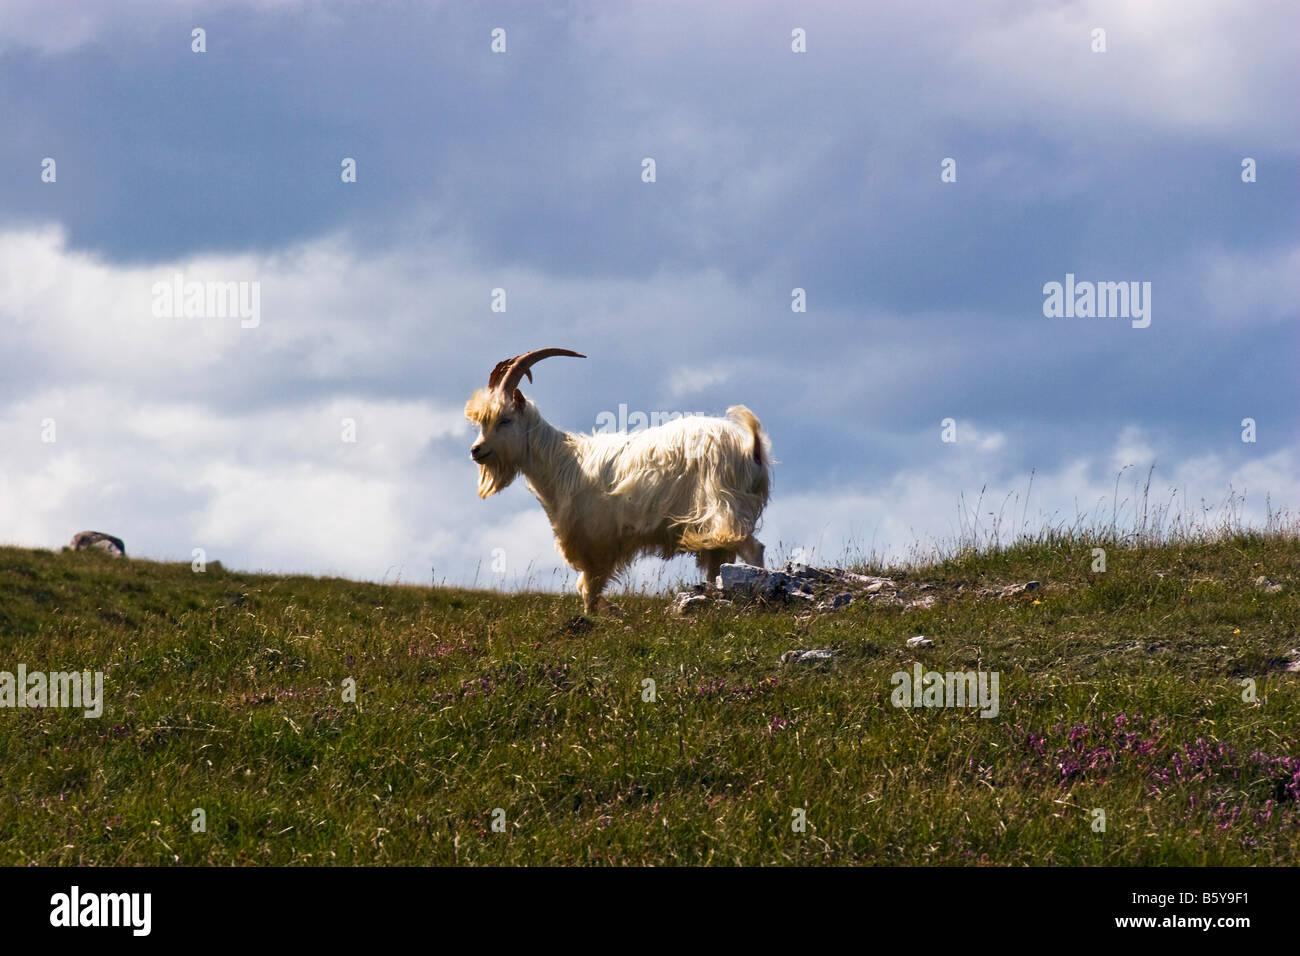 Kashmiri Goat, Capra Markhor, on Great Orme, Llandudno, wales - Stock Image